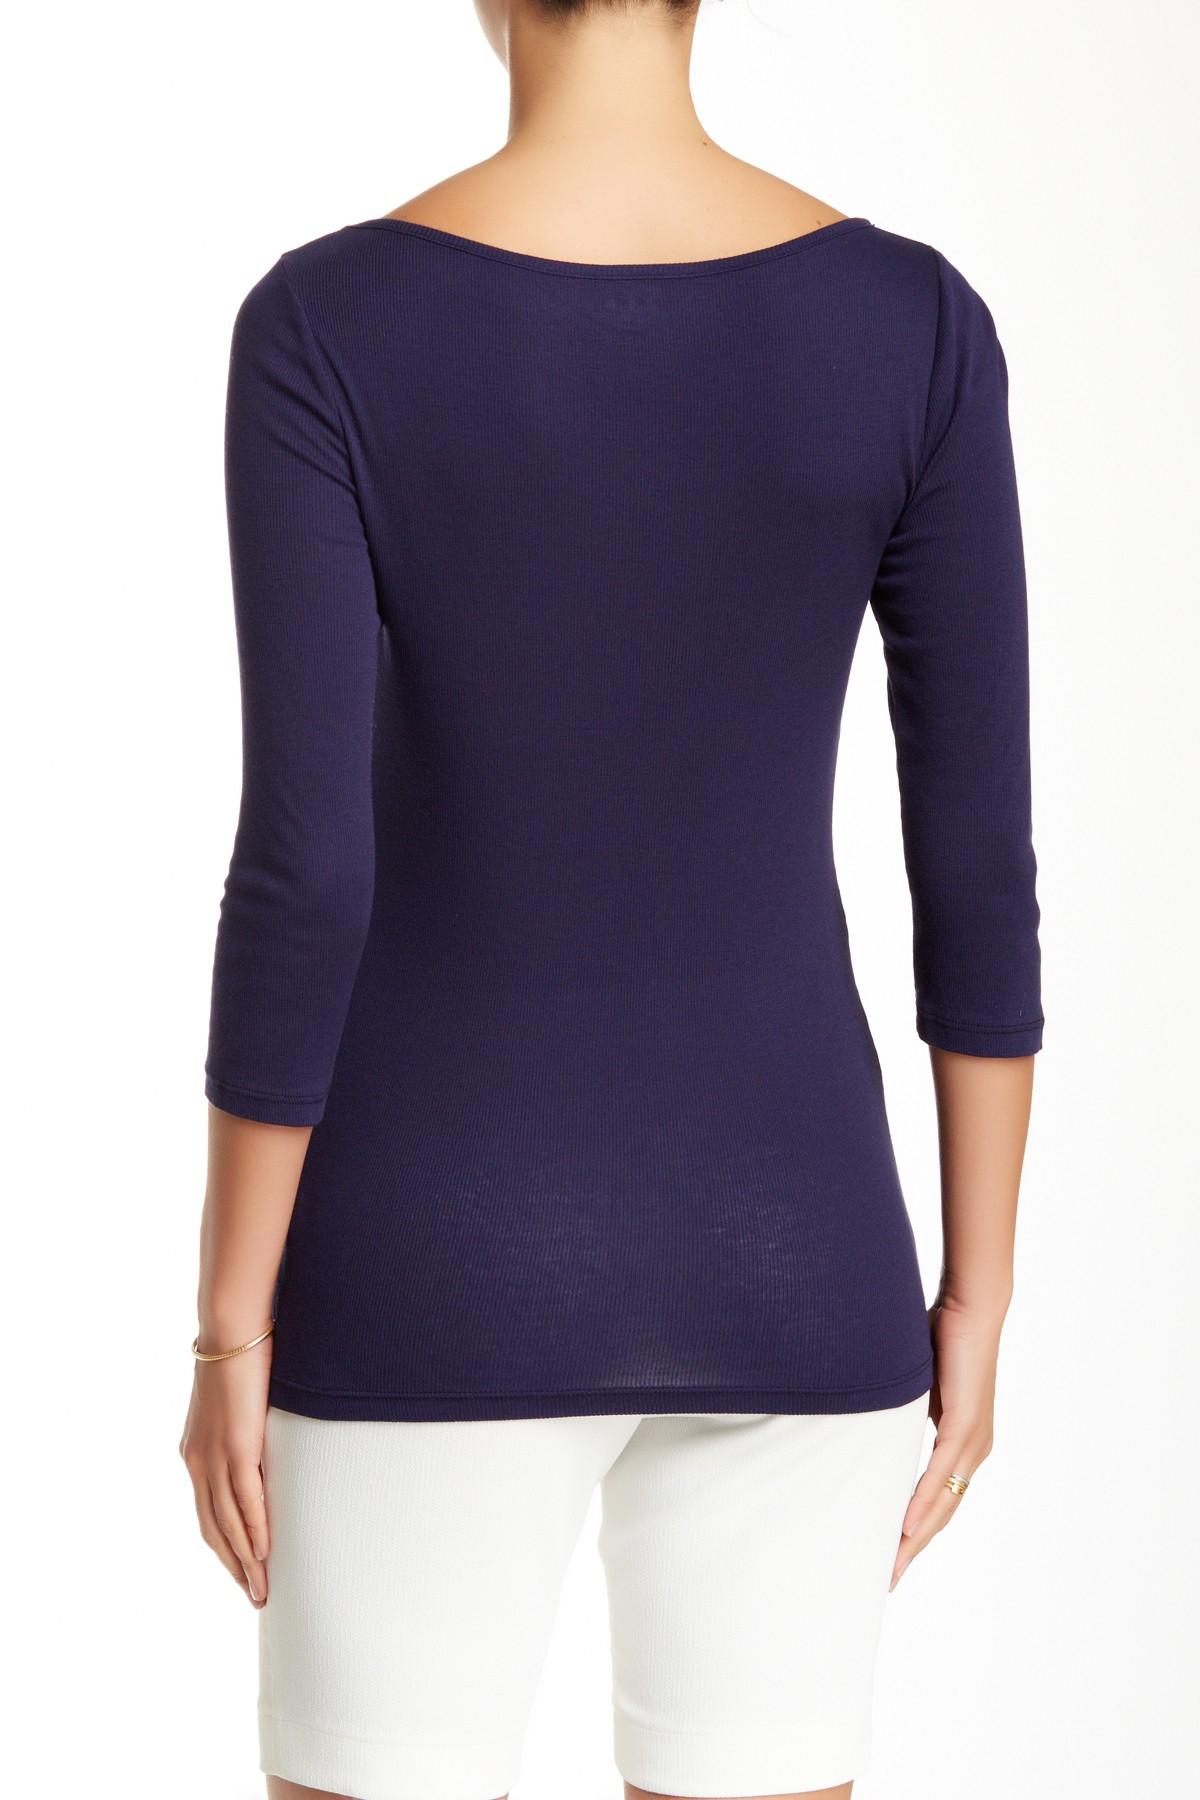 Three dots boatneck rib knit tee in blue lyst for Three dots t shirts